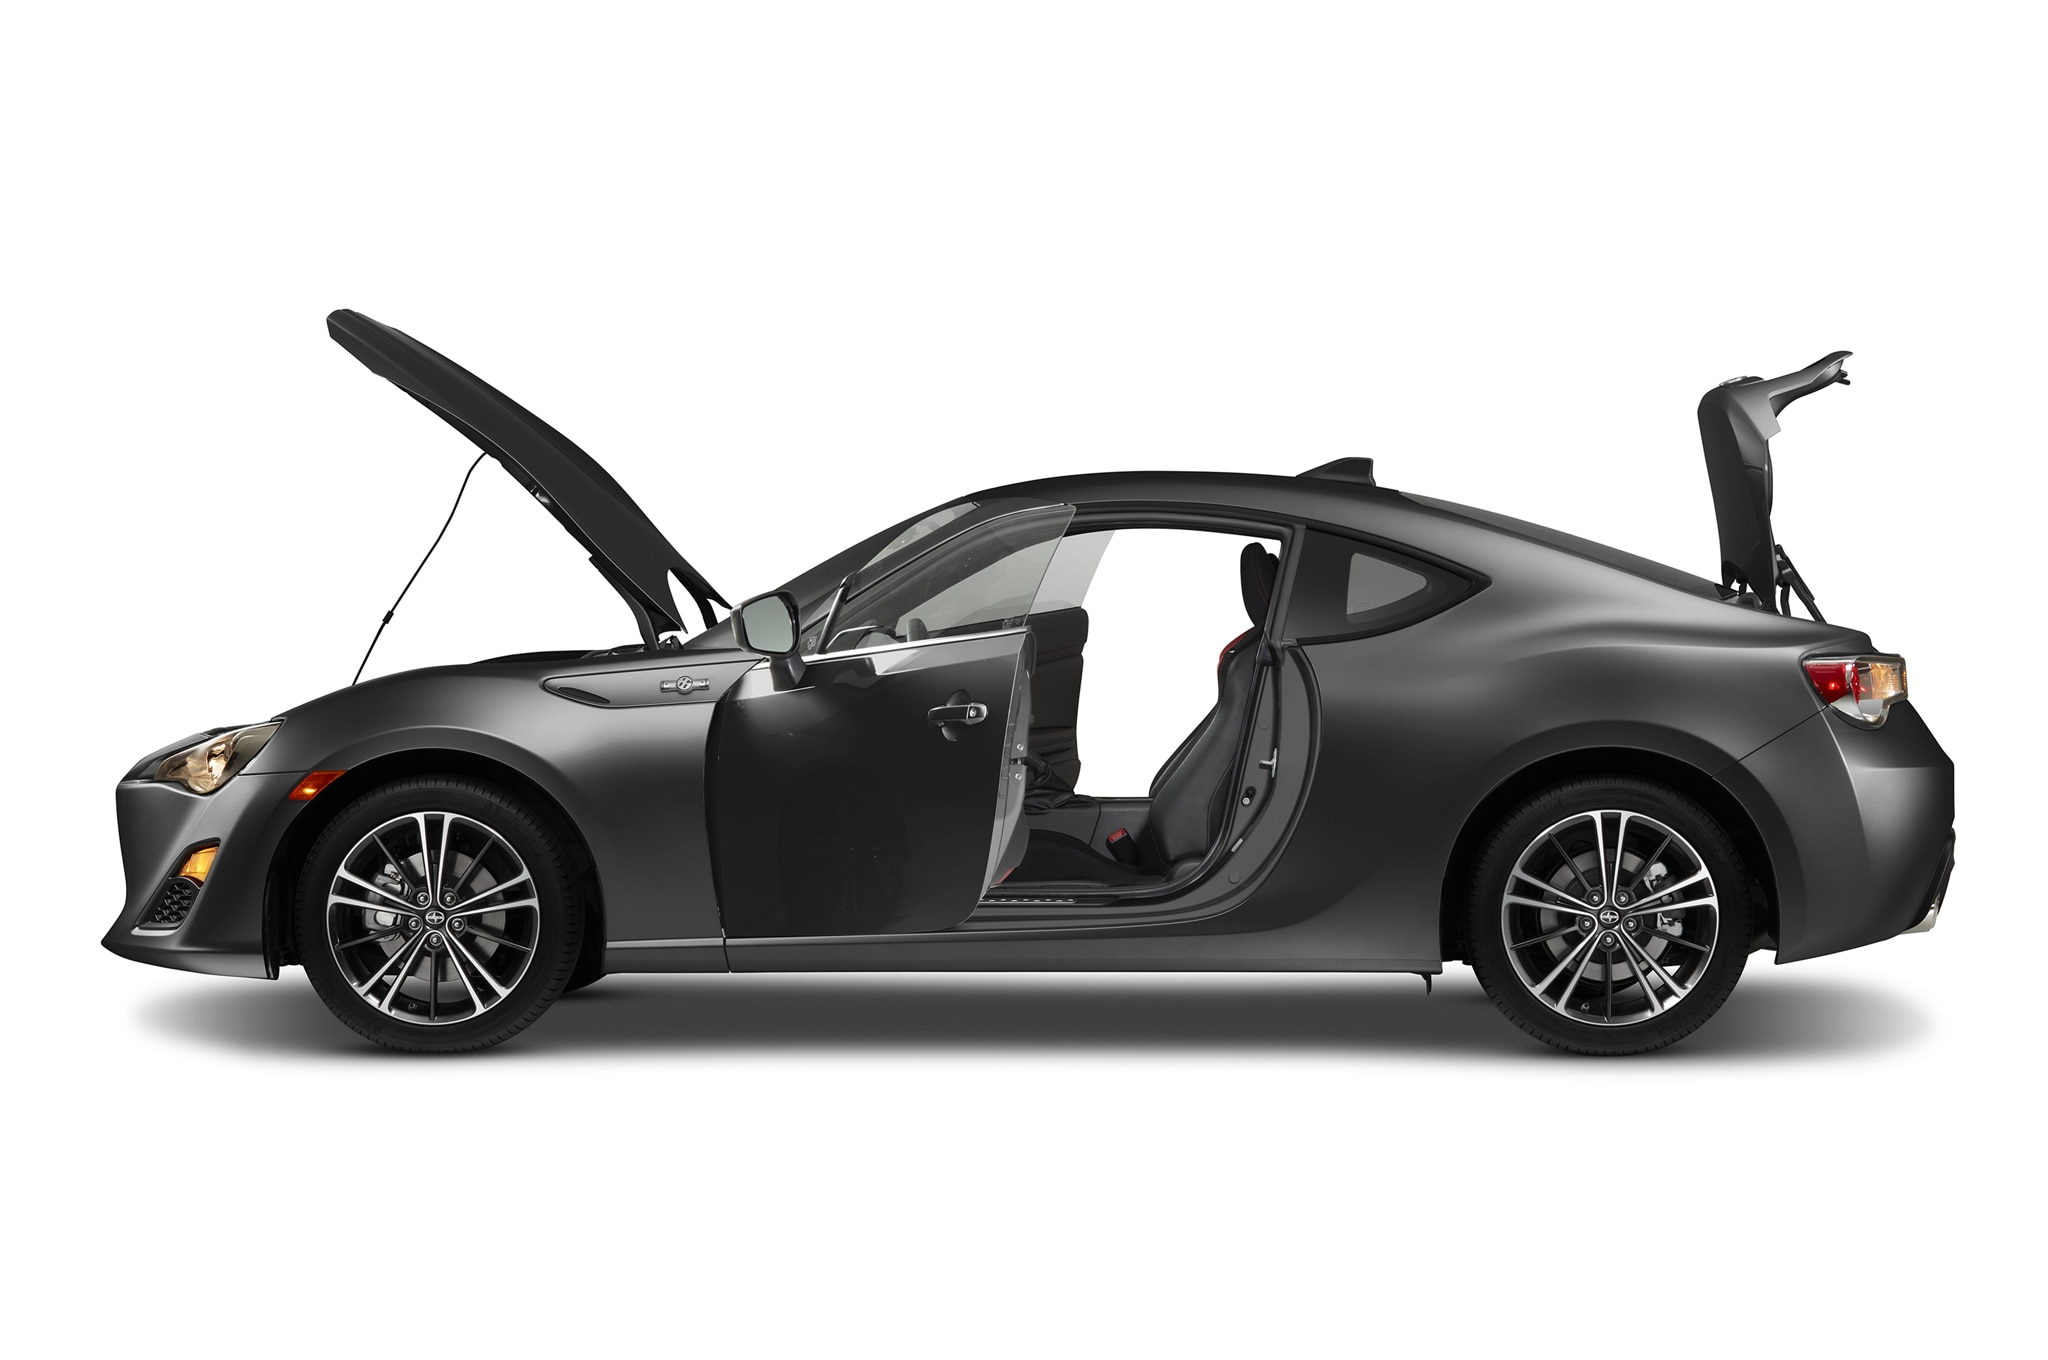 2015 scion fr s receives suspension tweaks automobile magazine. Black Bedroom Furniture Sets. Home Design Ideas